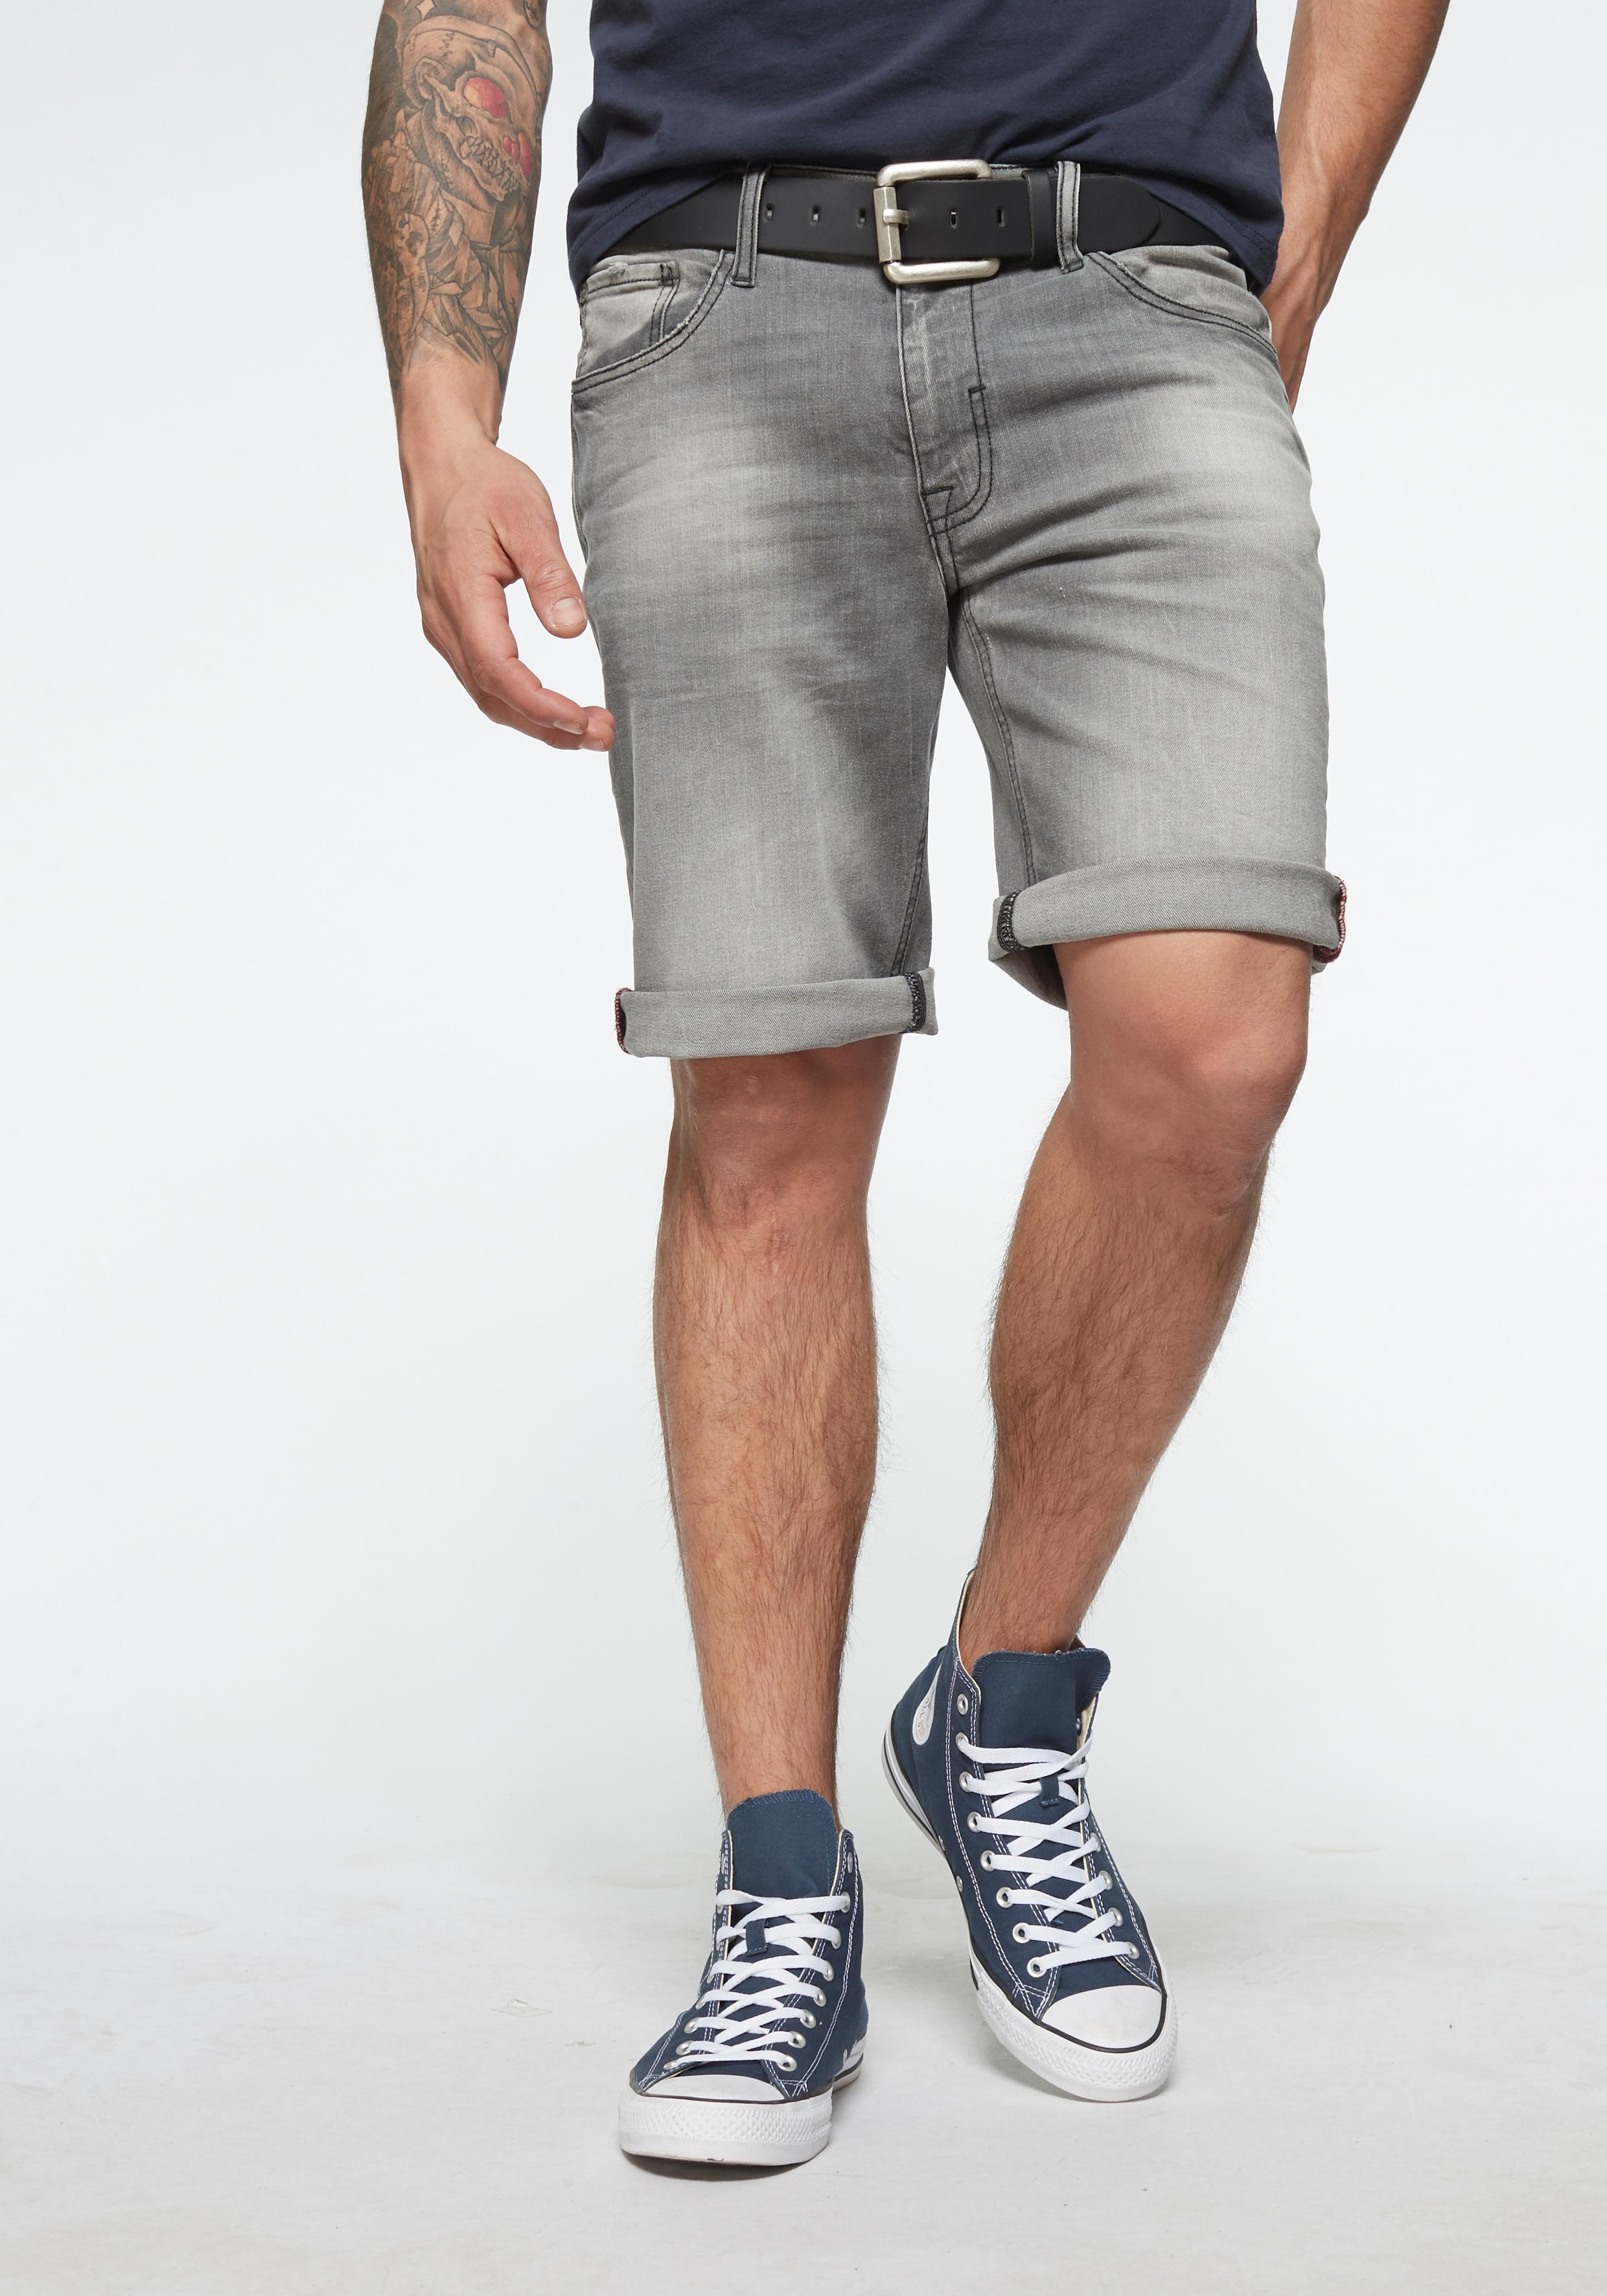 Blend Jeansbermudas »Twister« | Bekleidung > Shorts & Bermudas > Jeans Bermudas | Grau | Blend